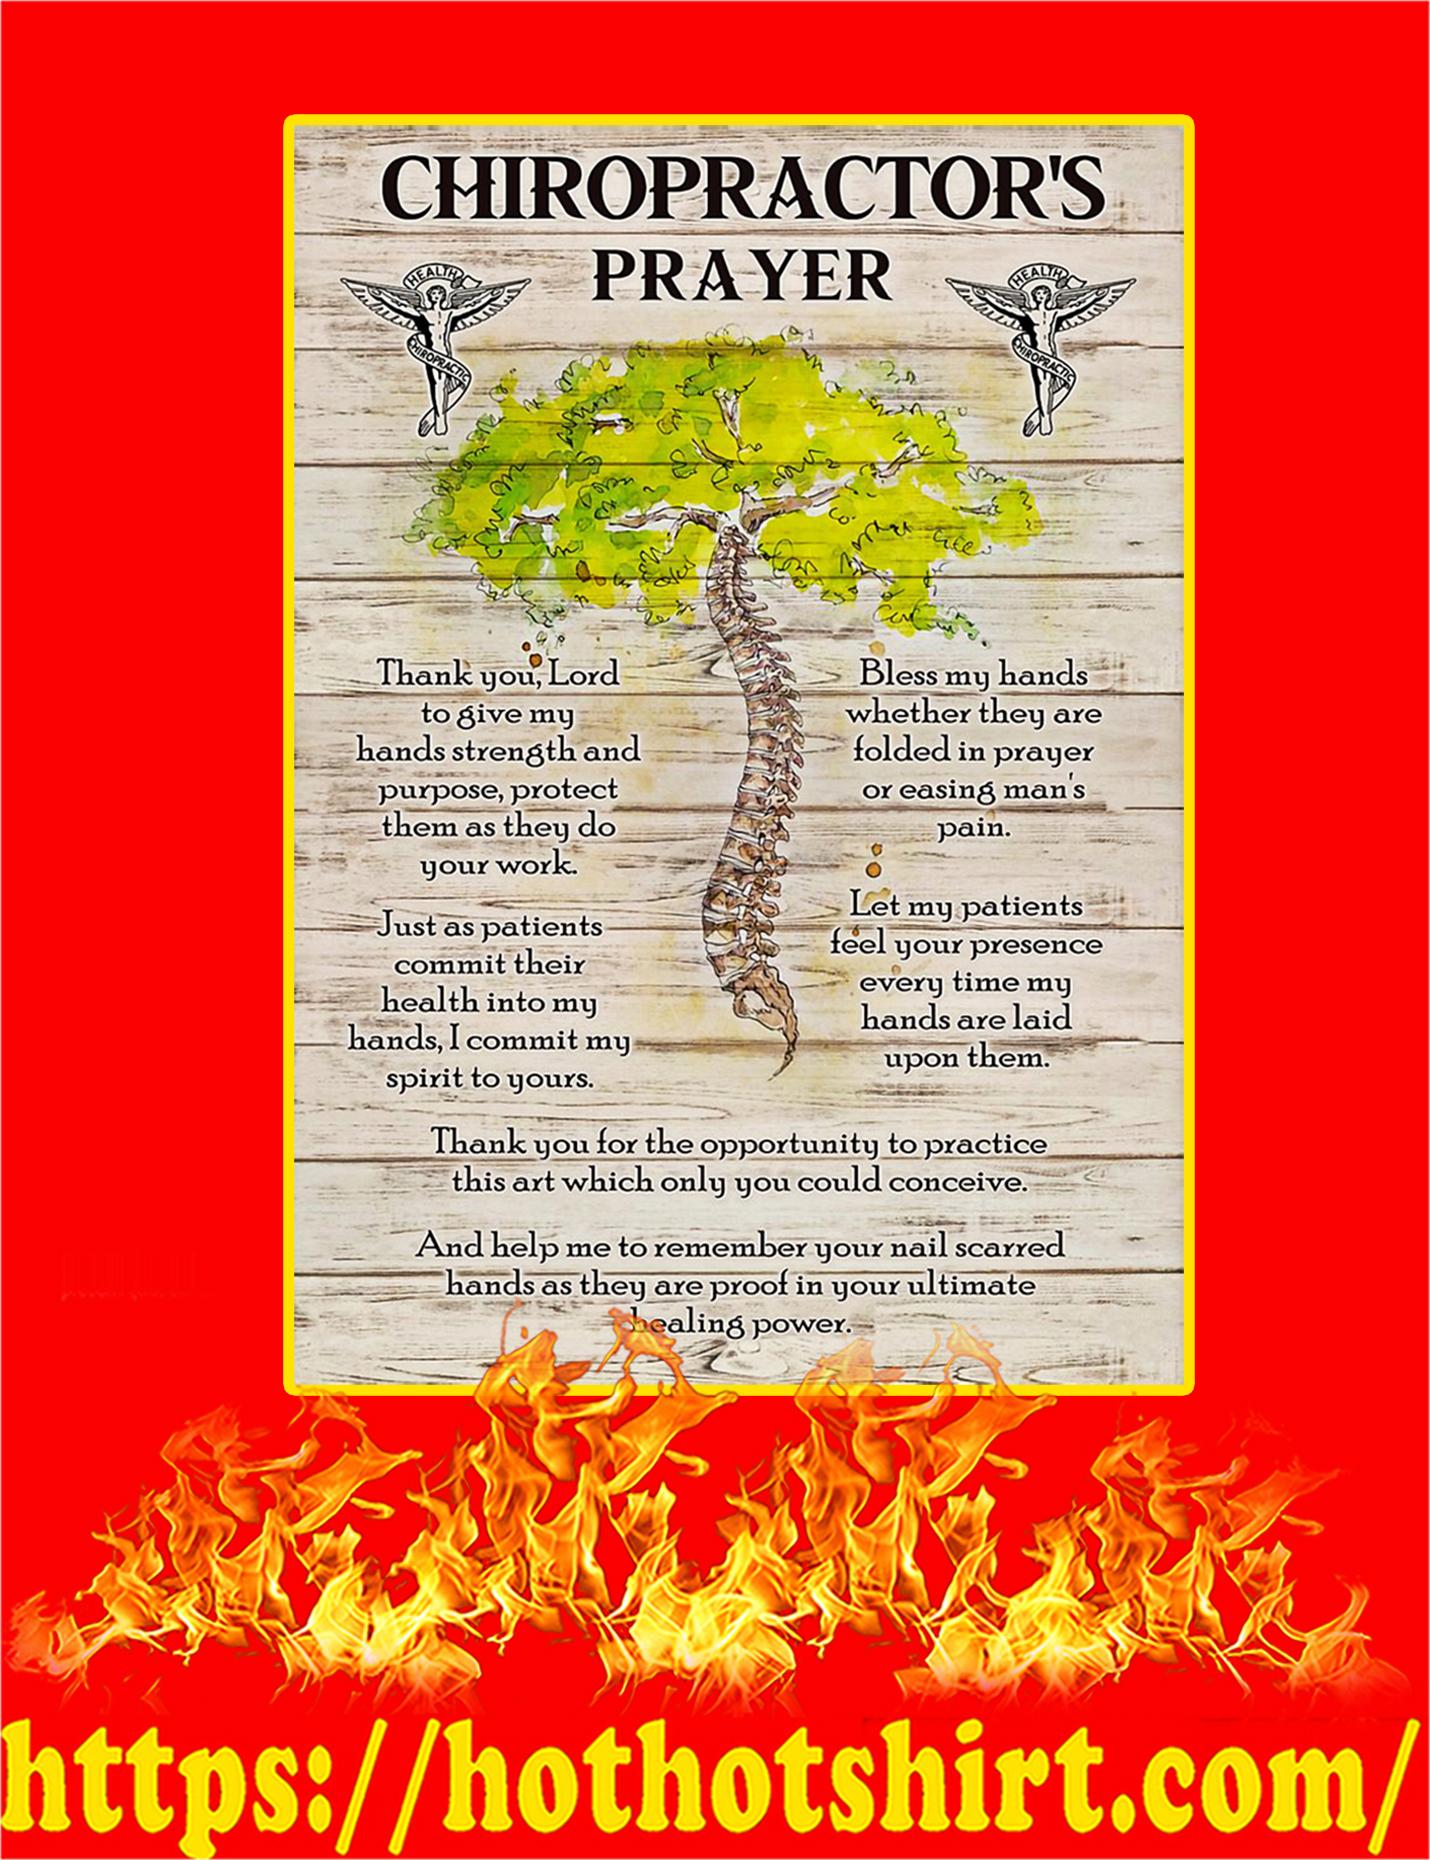 Chiropractor' Prayer Poster - A2